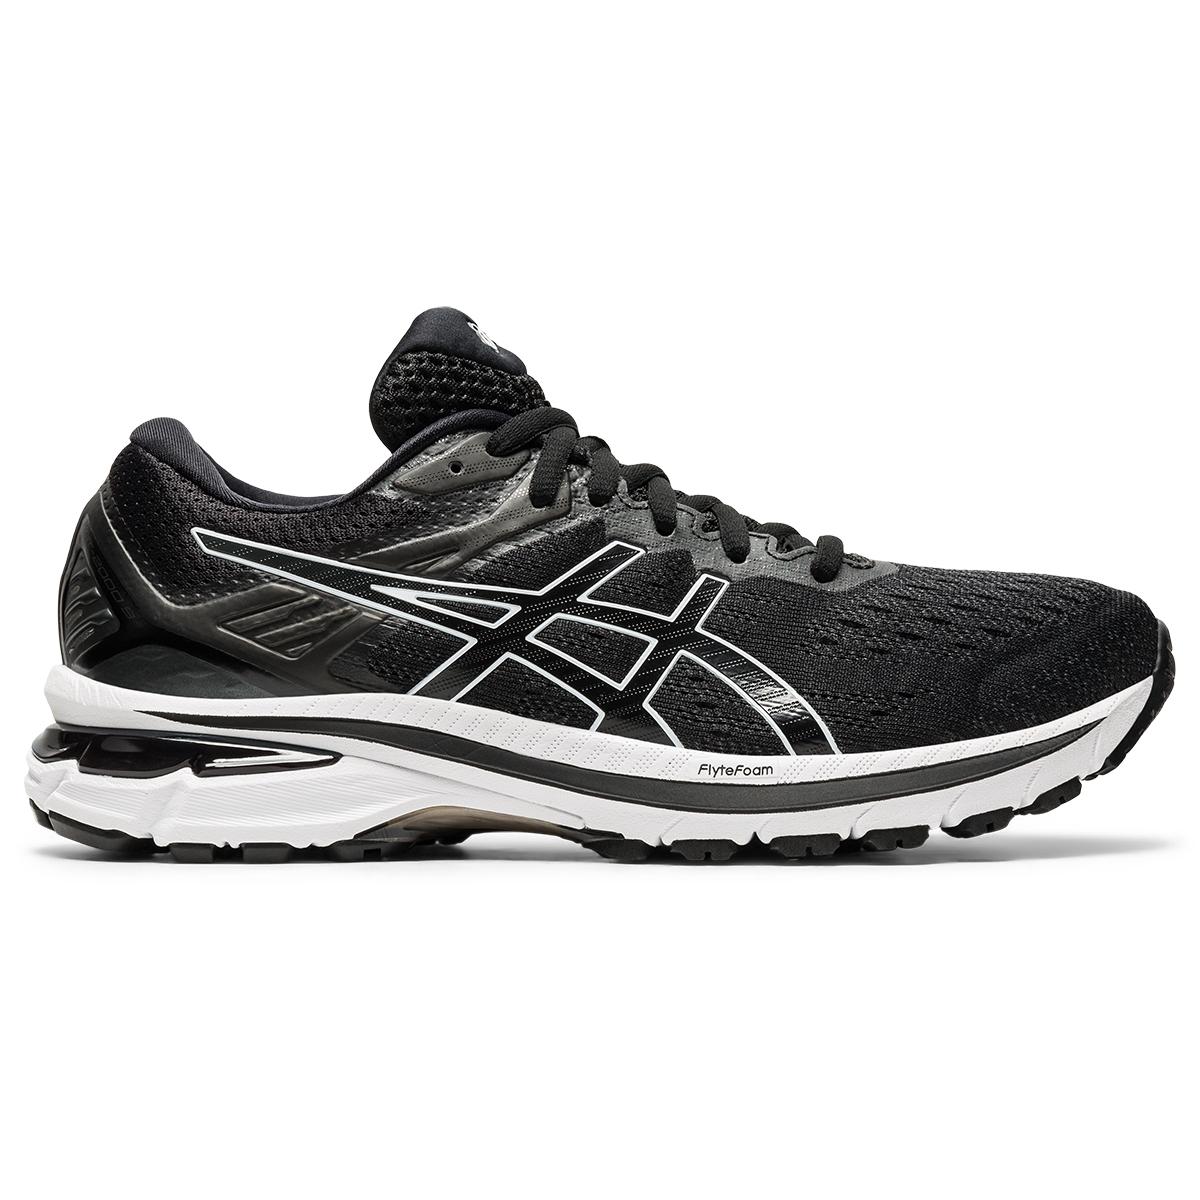 Women's Asics Gt-2000 9 Running Shoe - Color: Black/White - Size: 5 - Width: Regular, Black/White, large, image 1